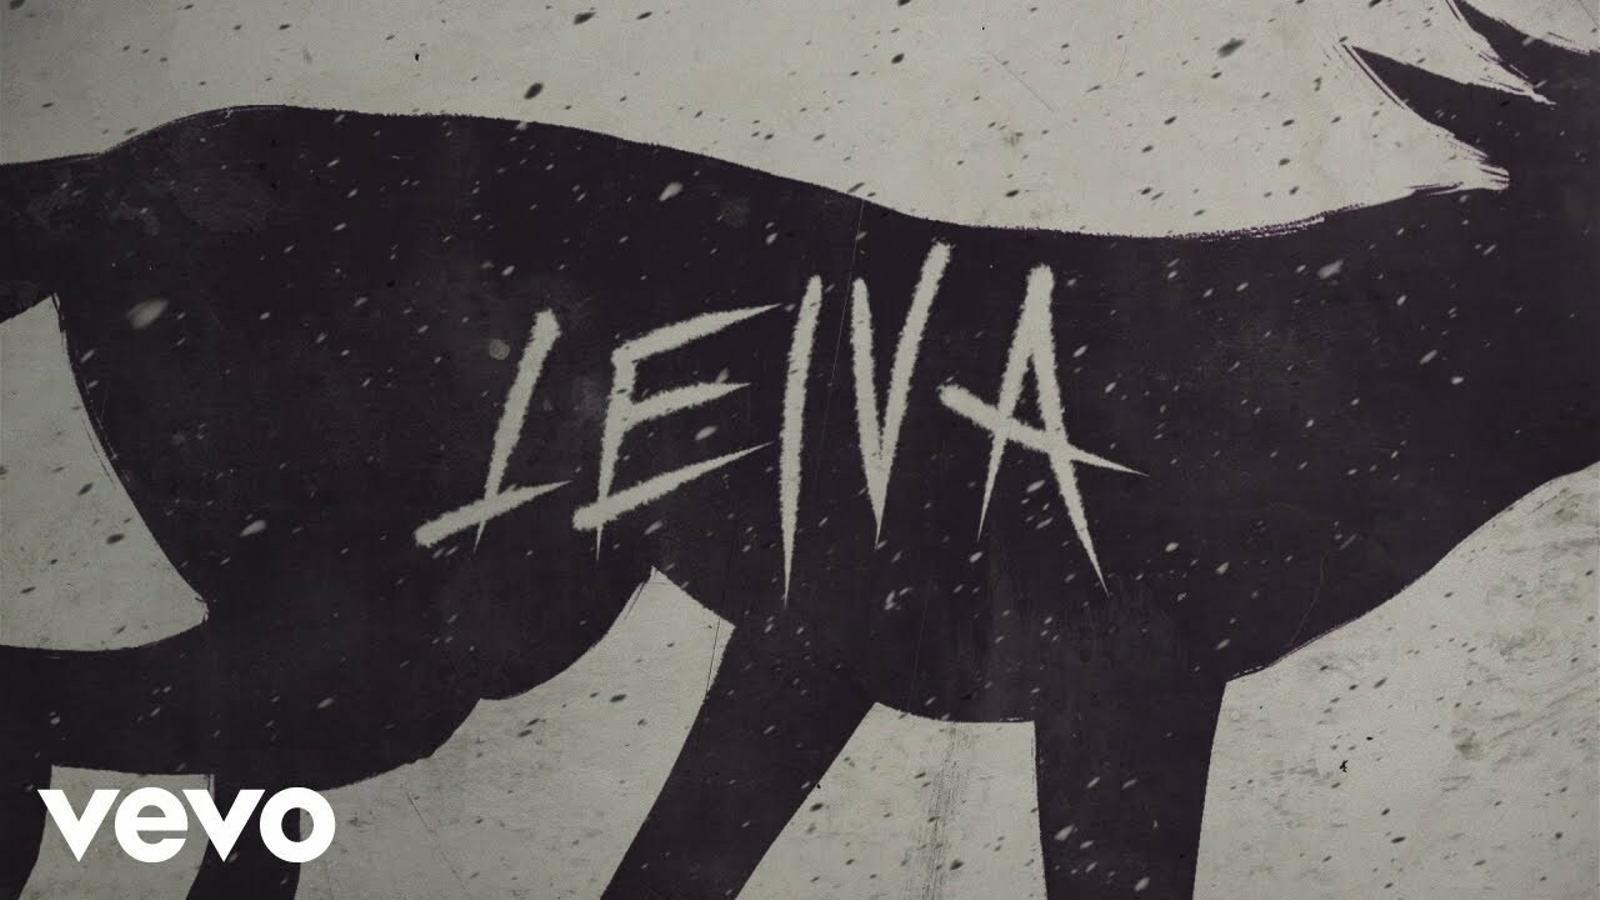 Leiva, 'Lobos'